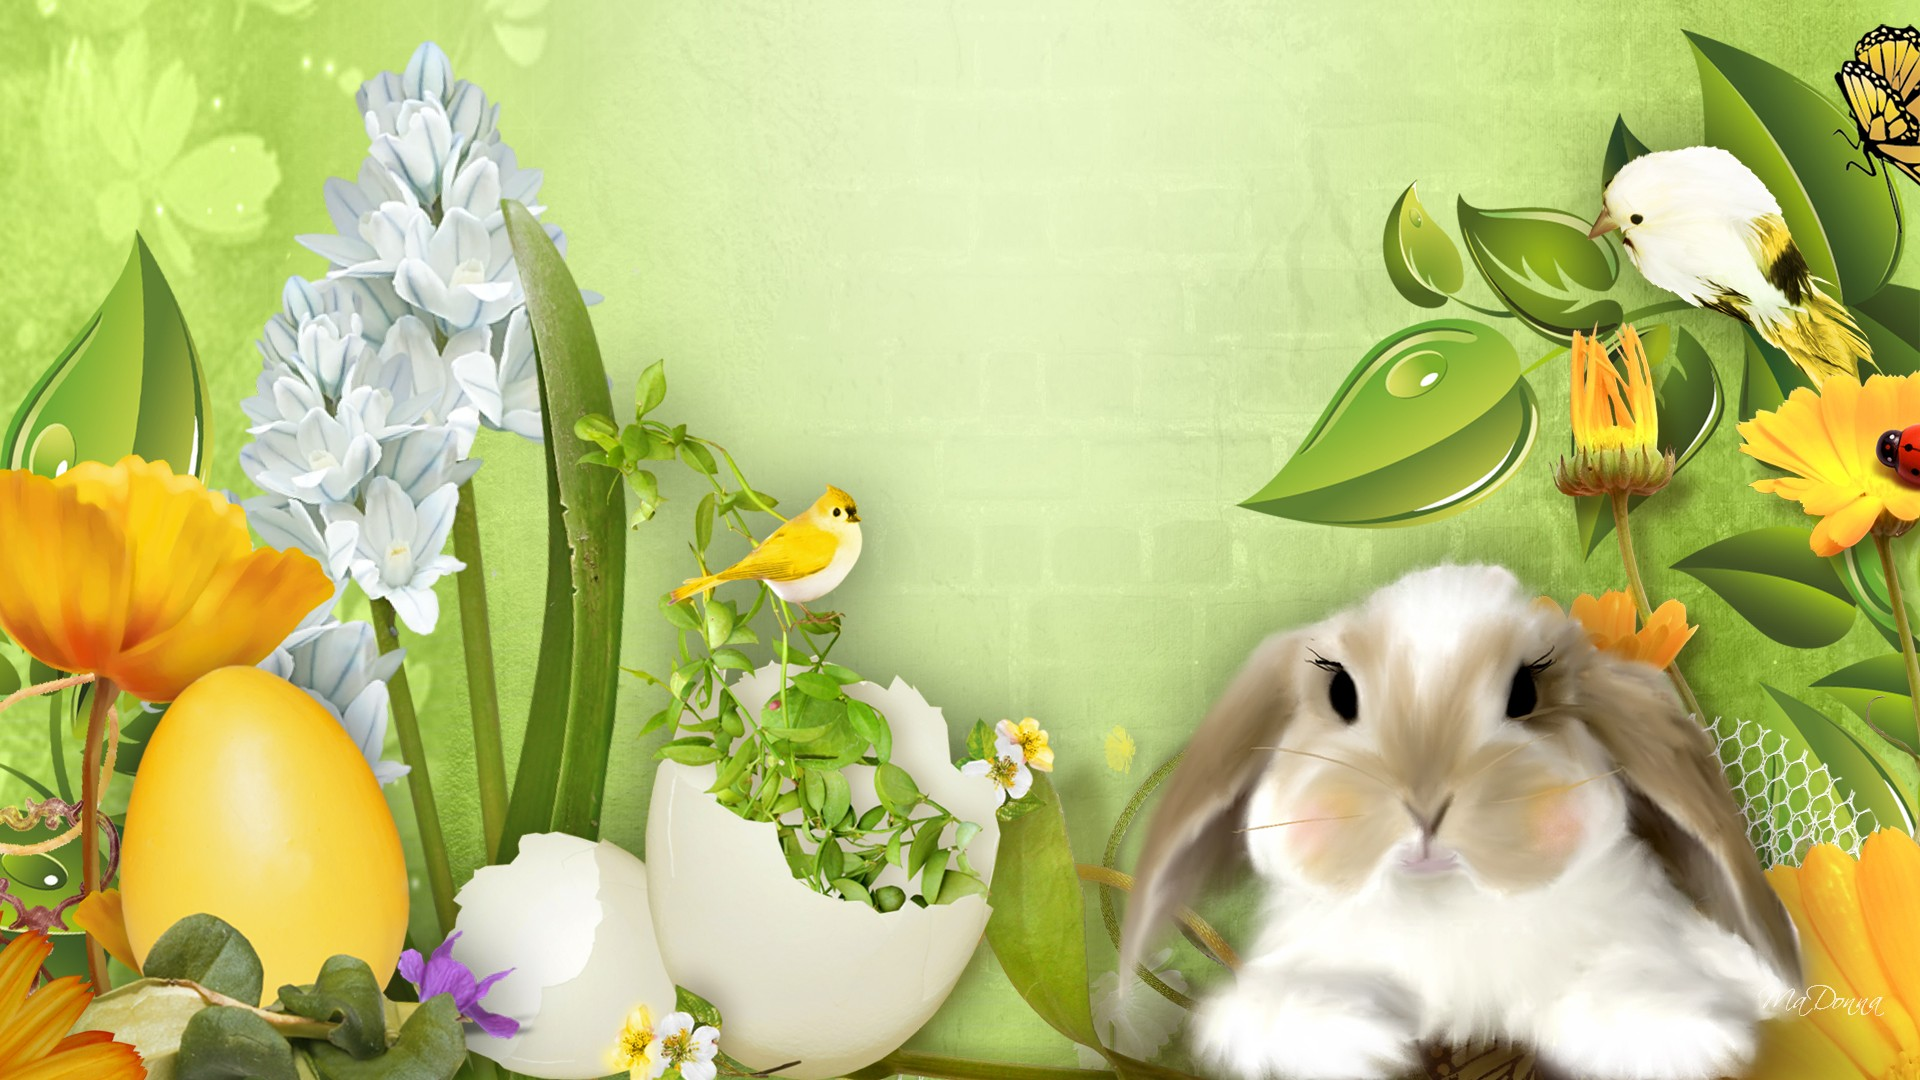 Easter 2014 HD   Wallpaper High Definition High Quality Widescreen 1920x1080